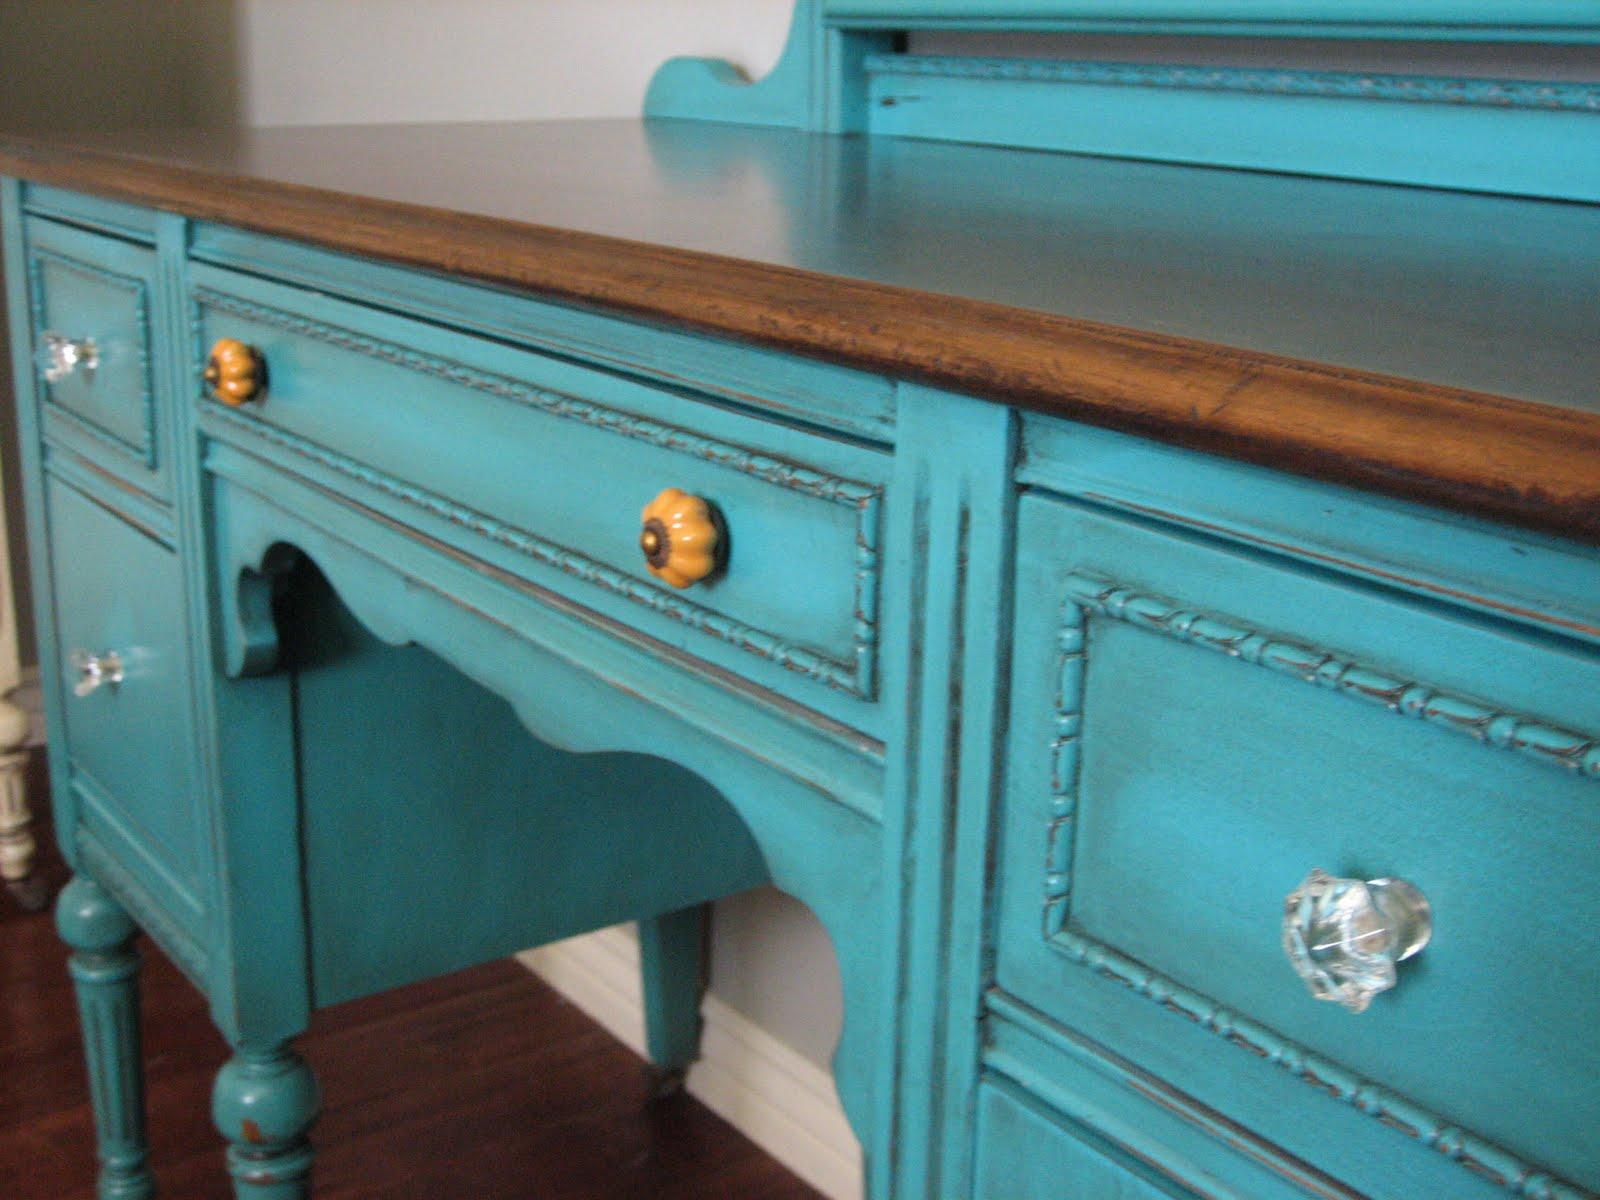 Turquoise/Teal & Cream Bedroom Set